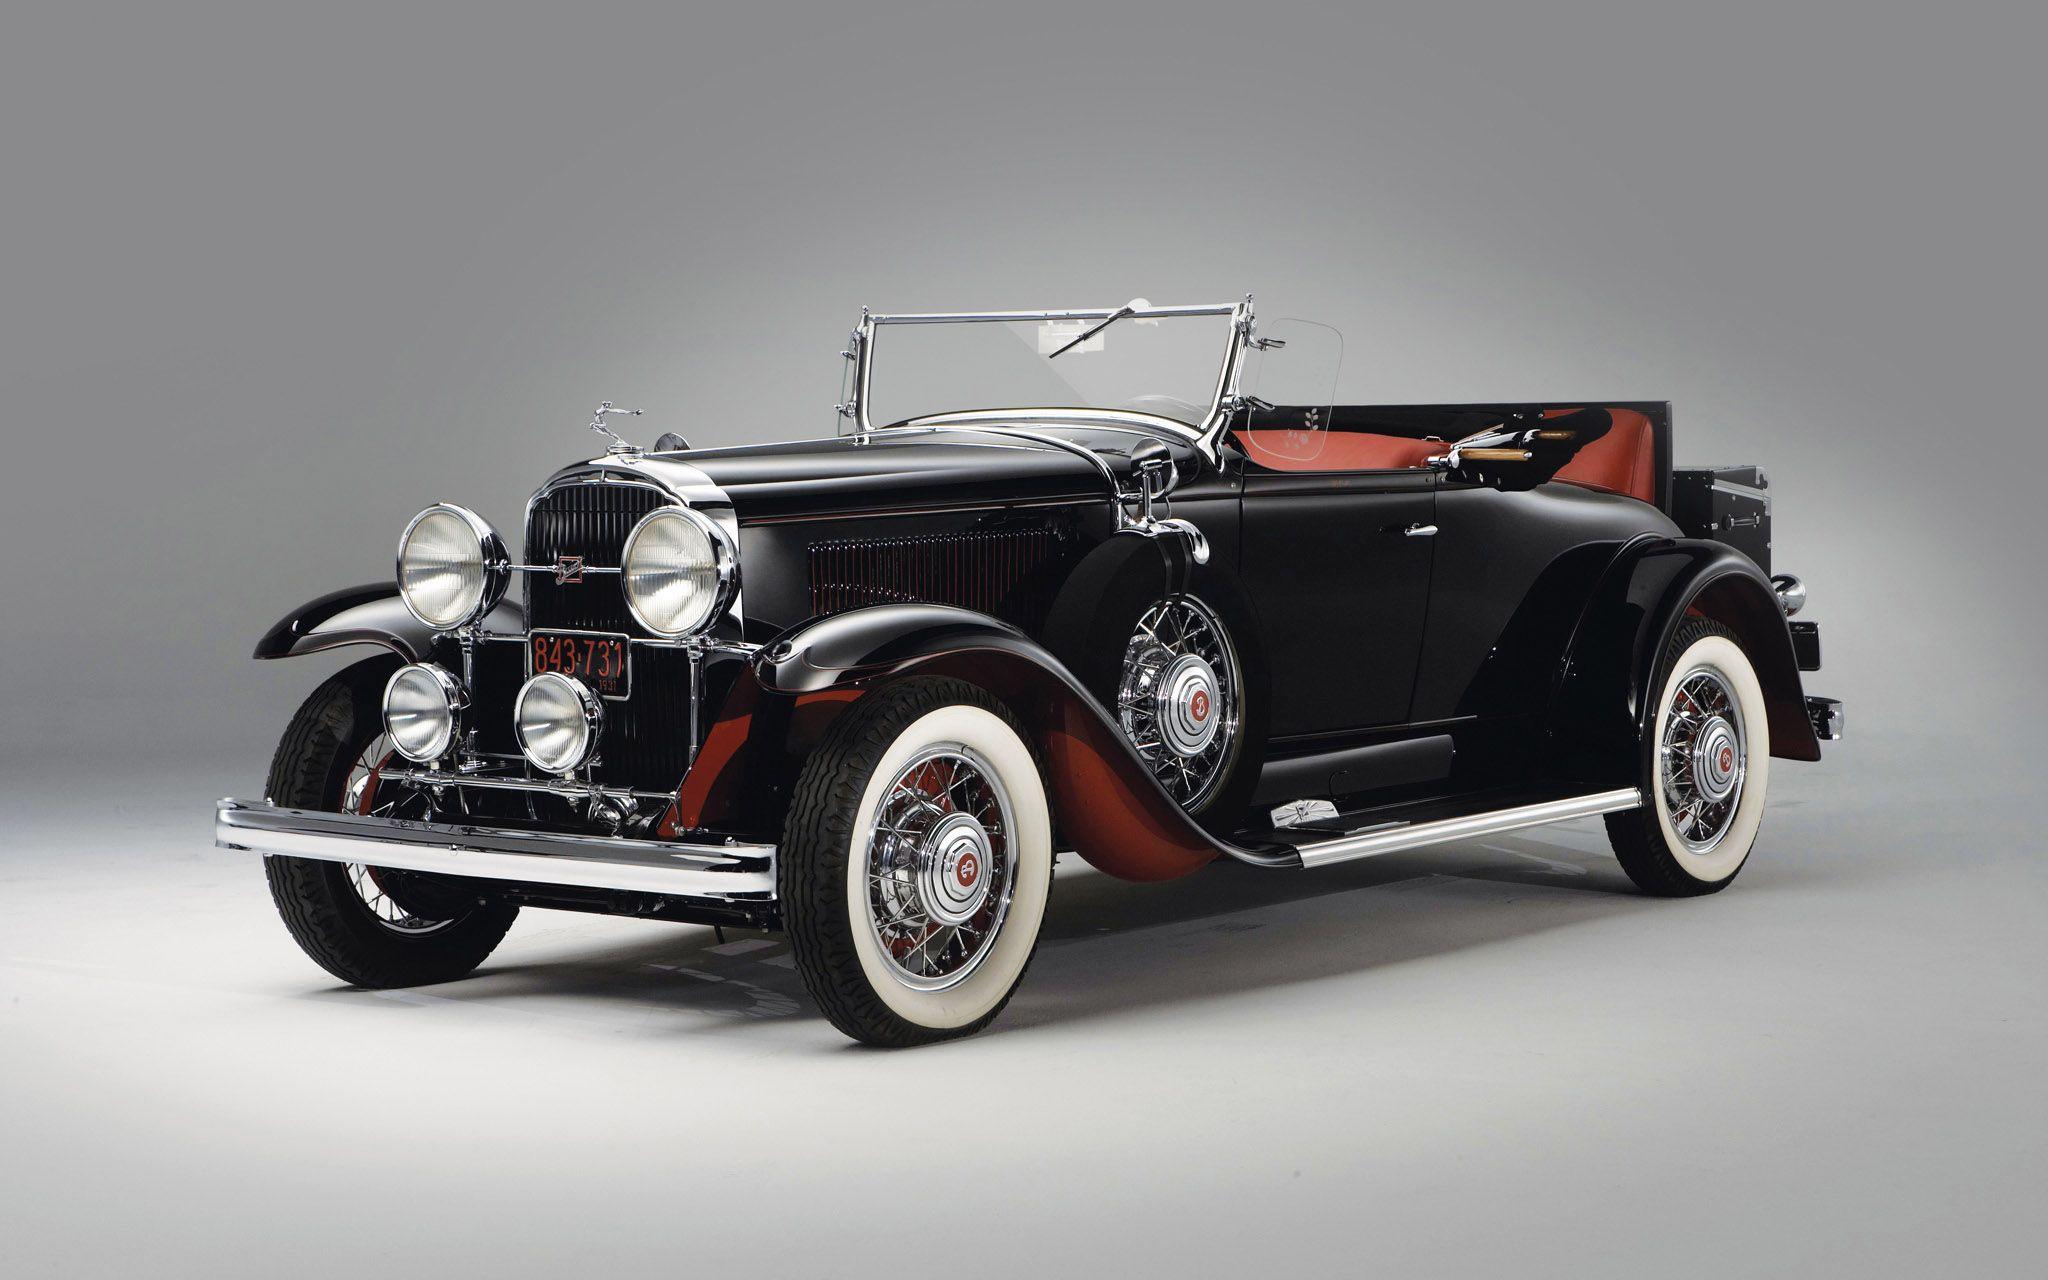 Classic Car wallpaper | CLASIC CAR | Pinterest | Car wallpapers ...